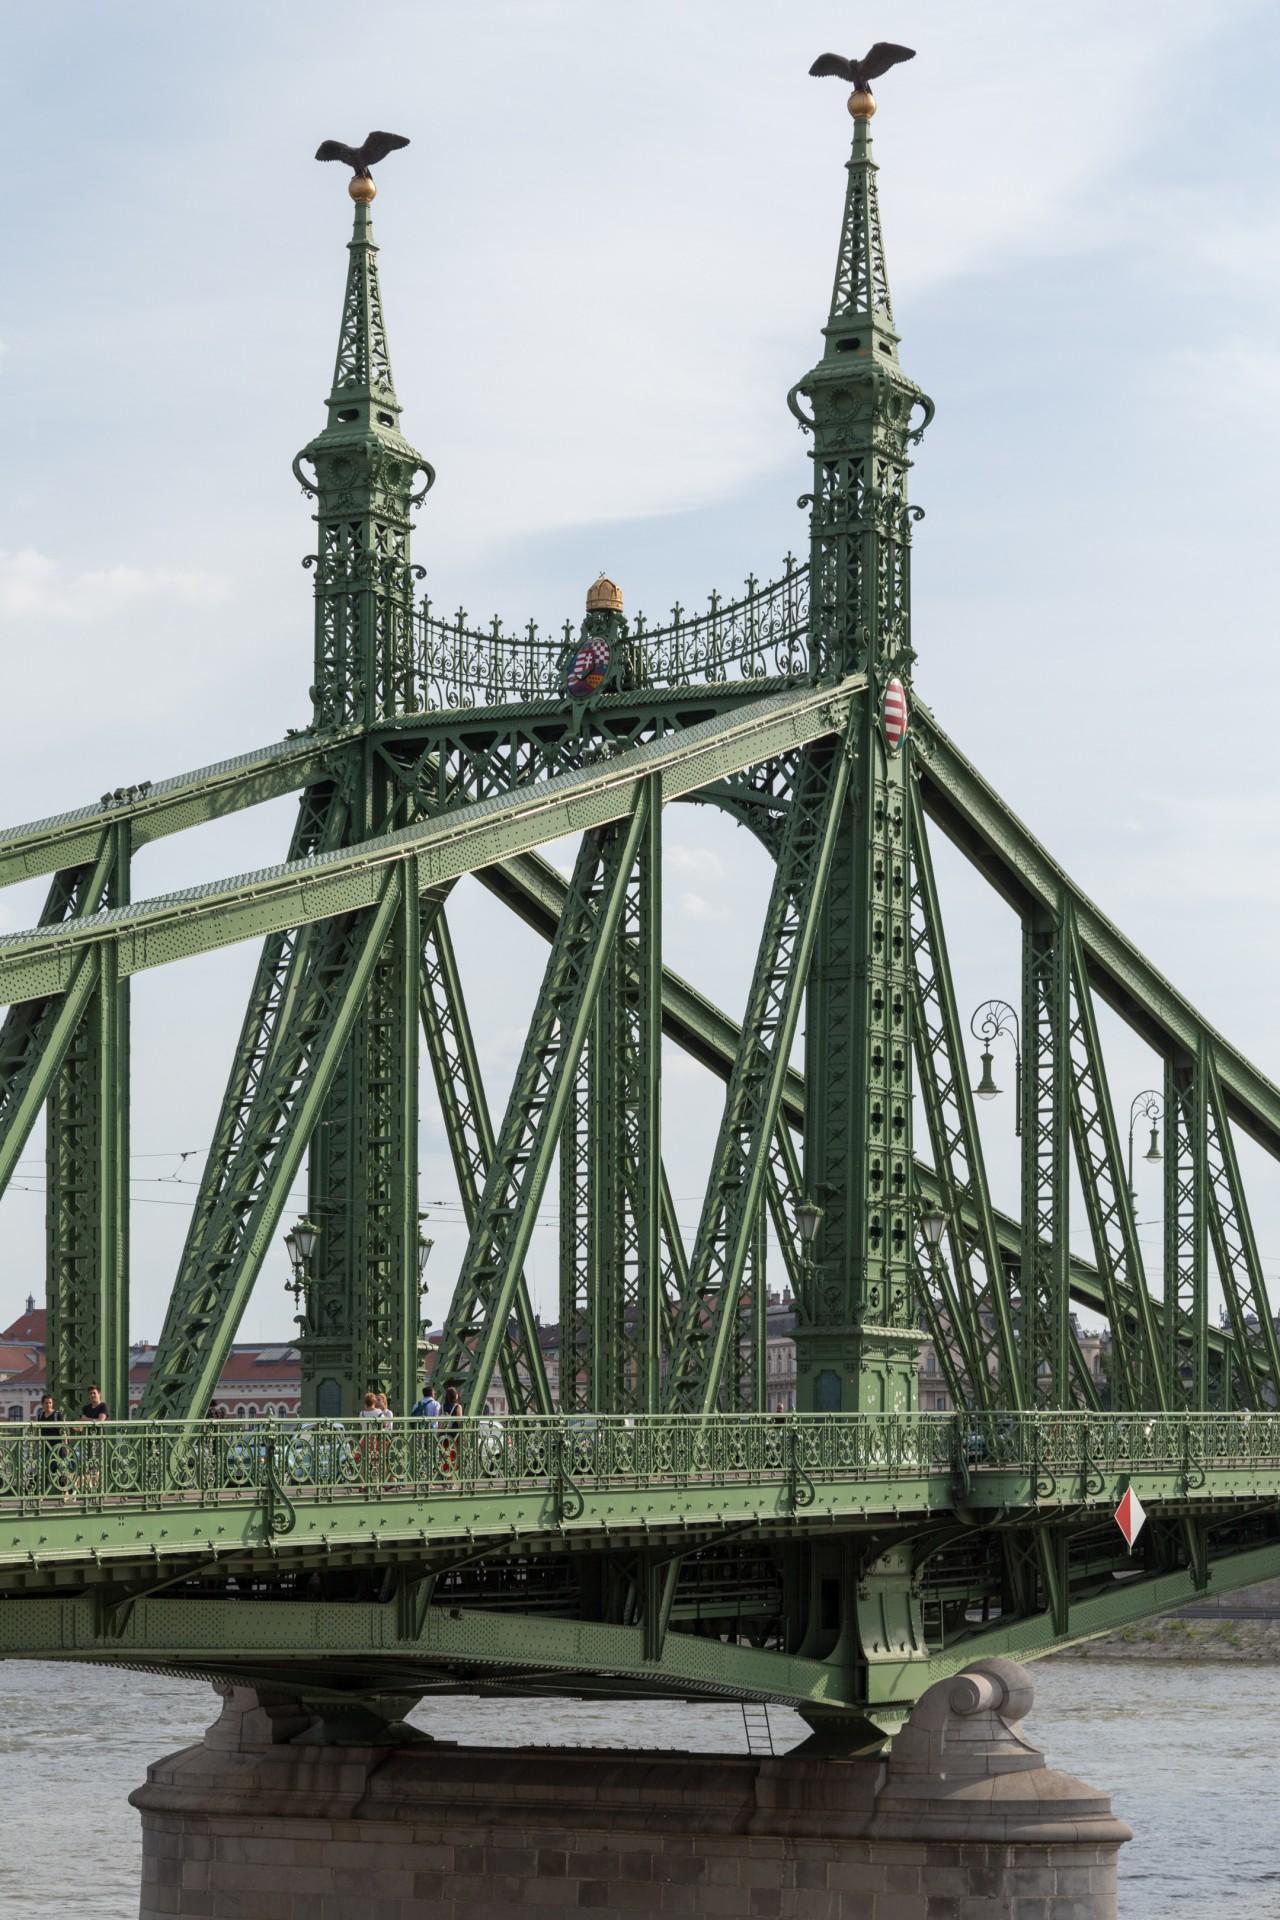 Konstruktion der Freiheitsbrücke (Szabadság híd) Budapest